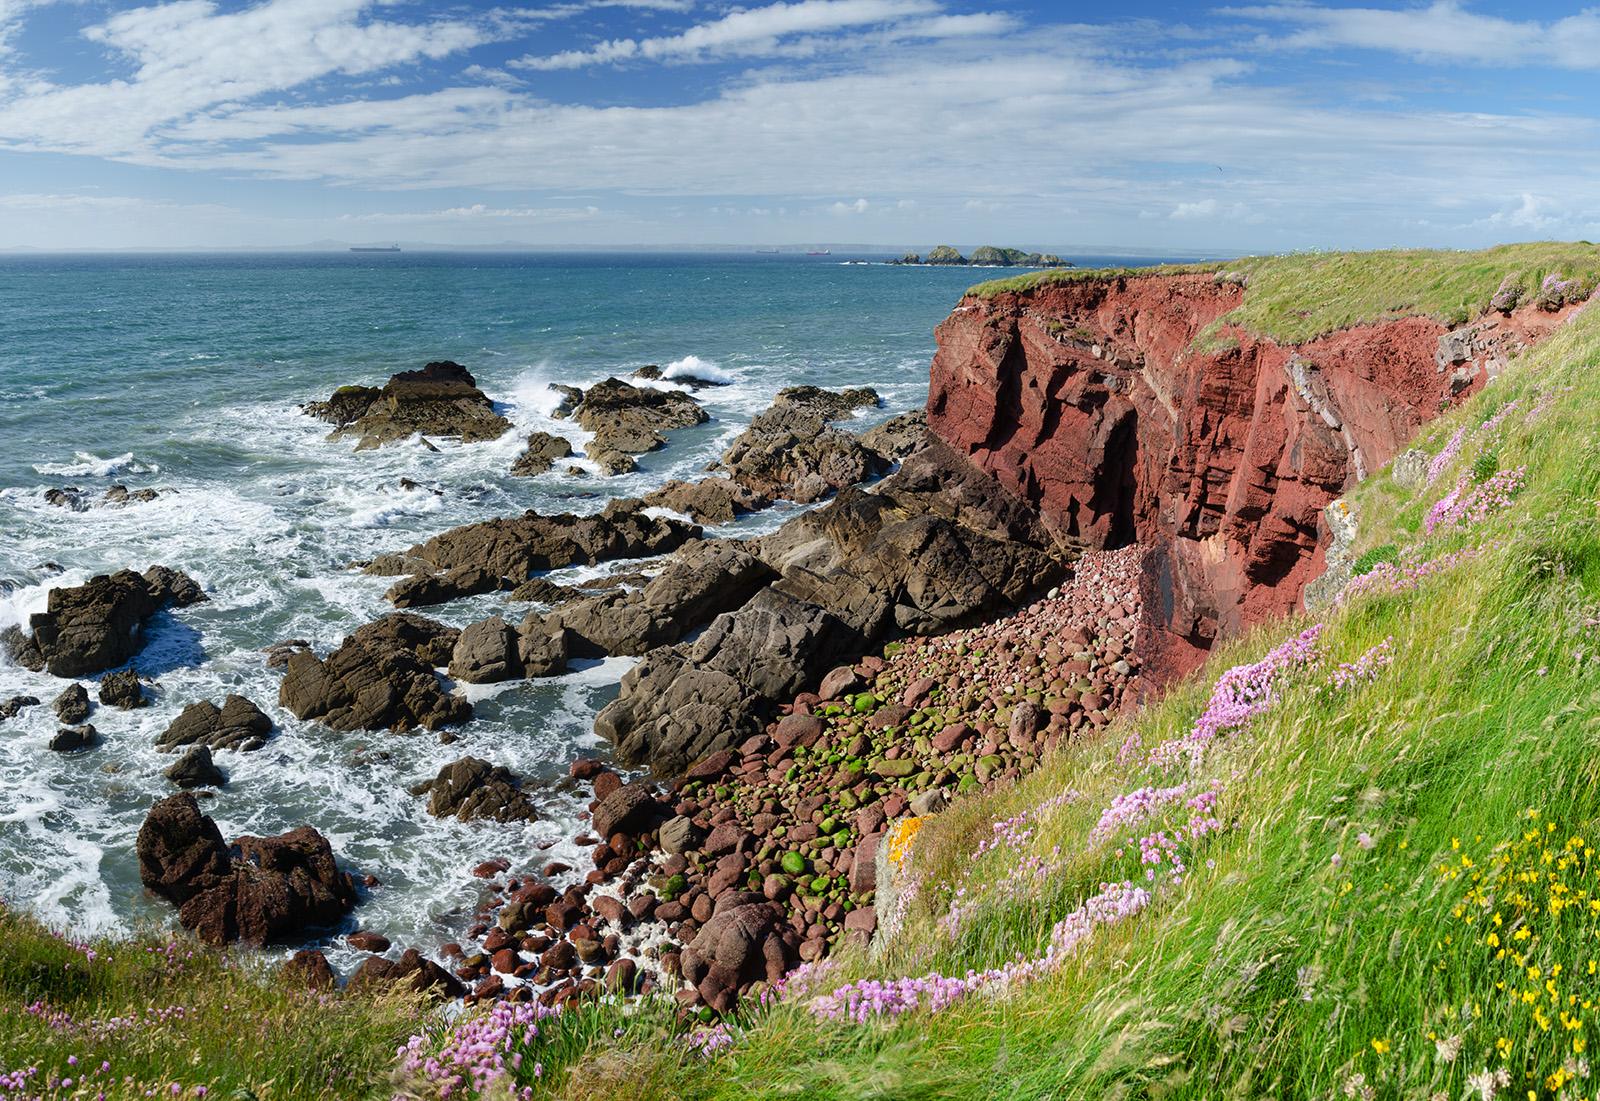 druidstone_haven_marloes-panorama10-2